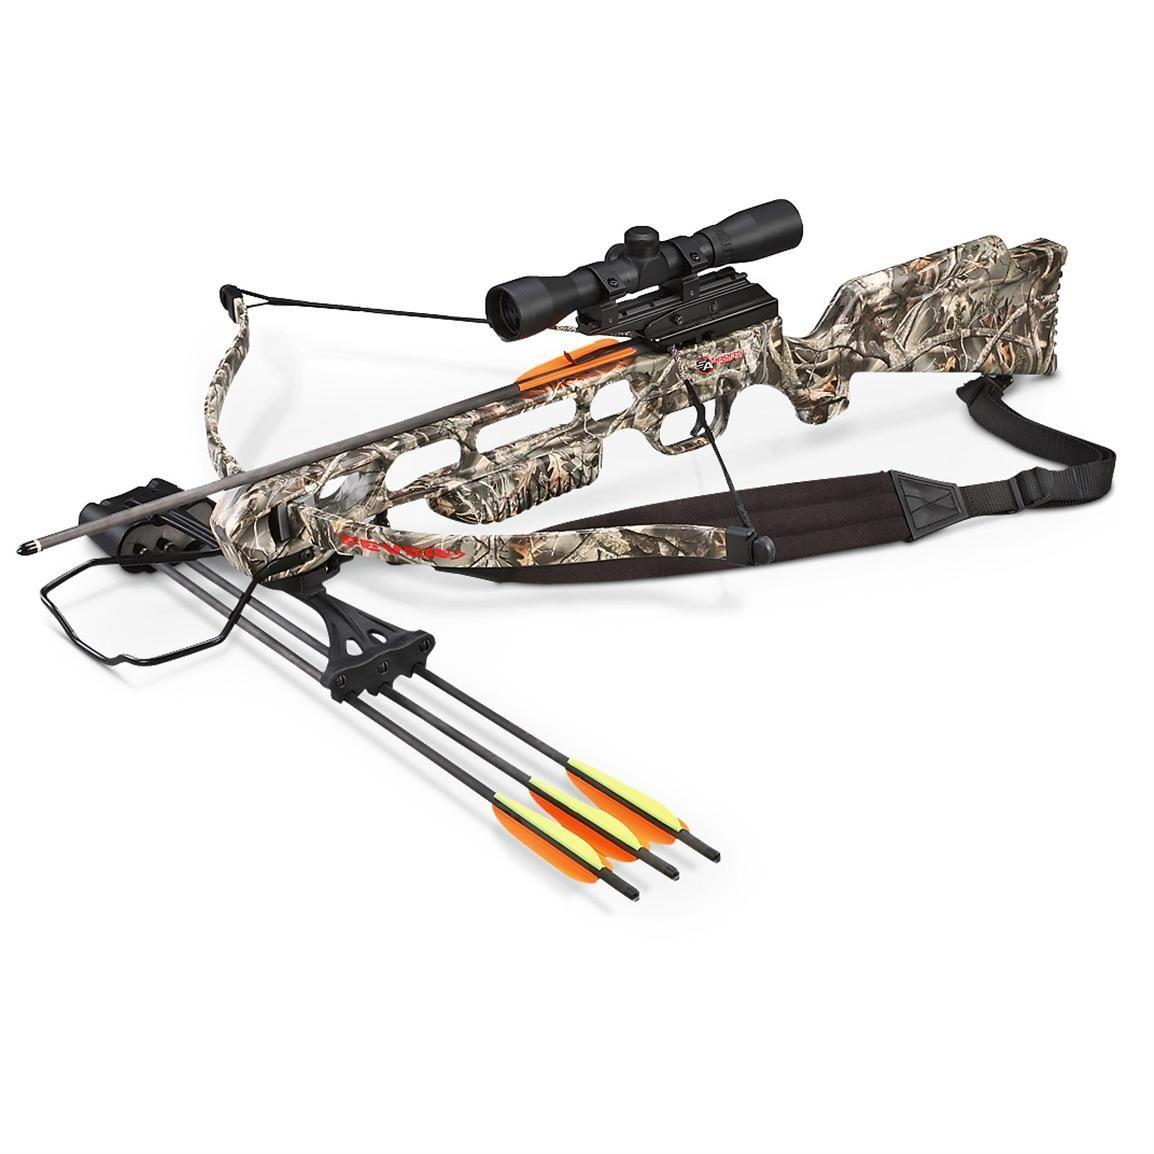 Camo crossbow. crossbowhunting Crossbow, Crossbow